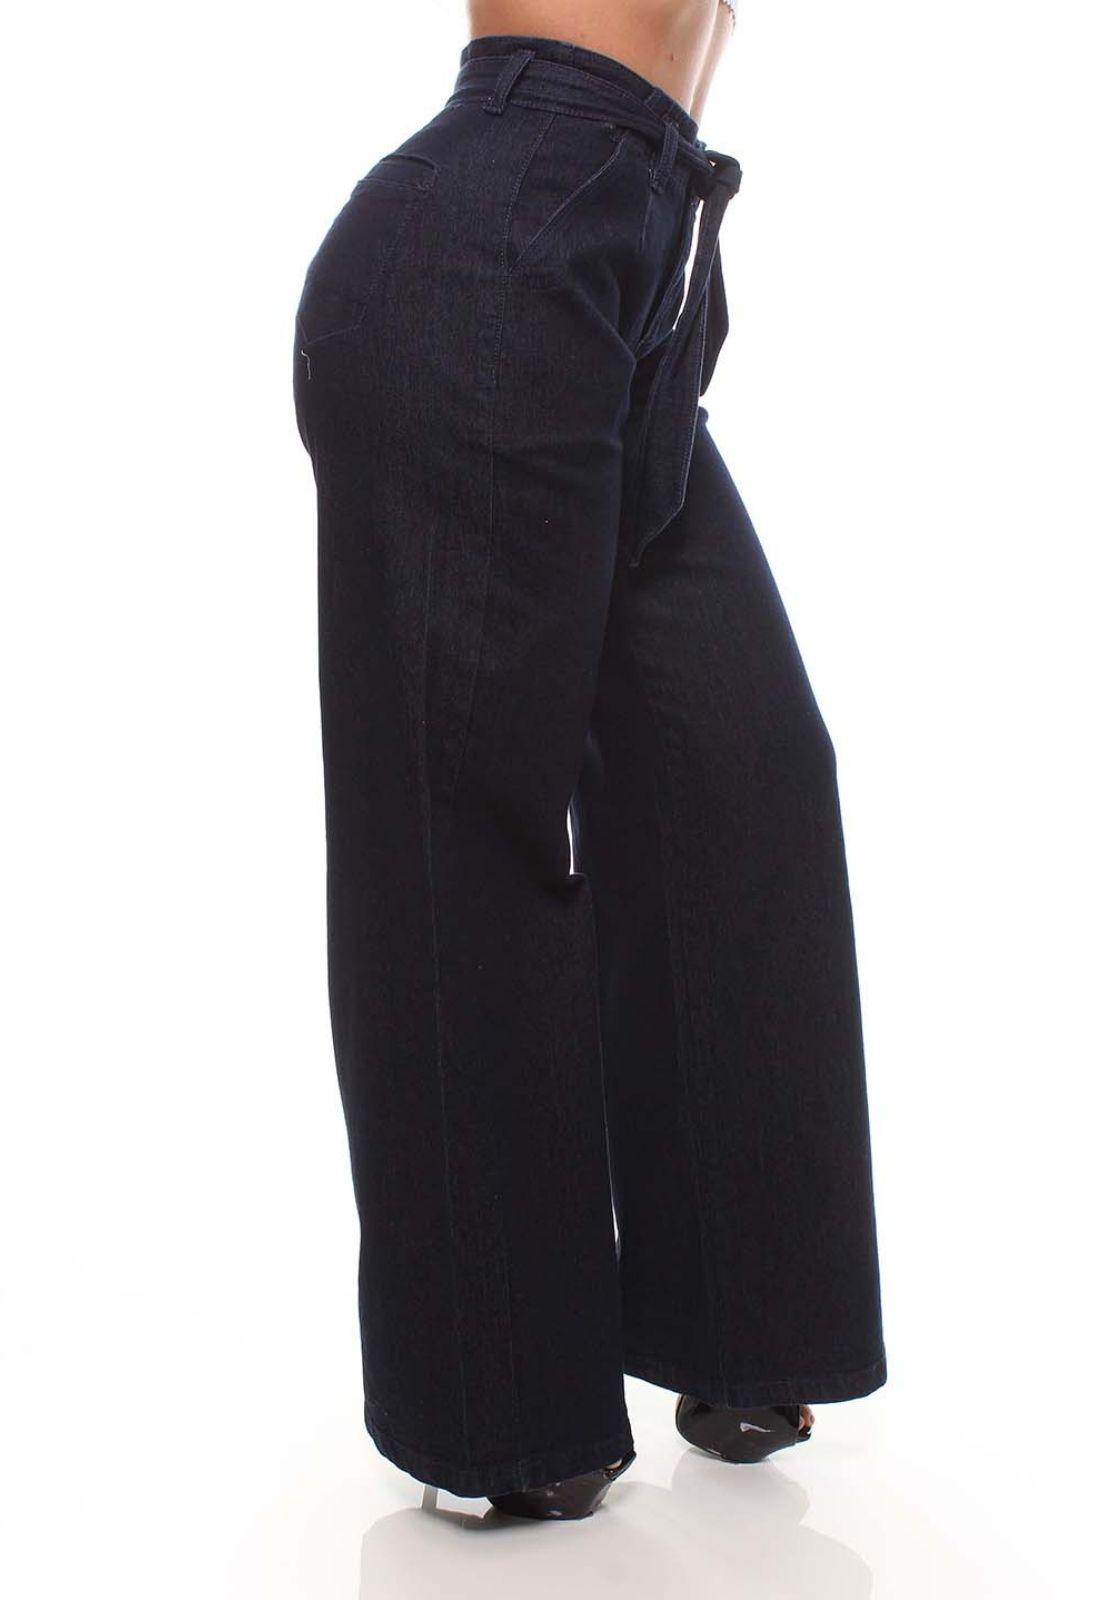 Calça Jeans Feminina Pantalona Crocker - 47553  - CROCKER JEANS